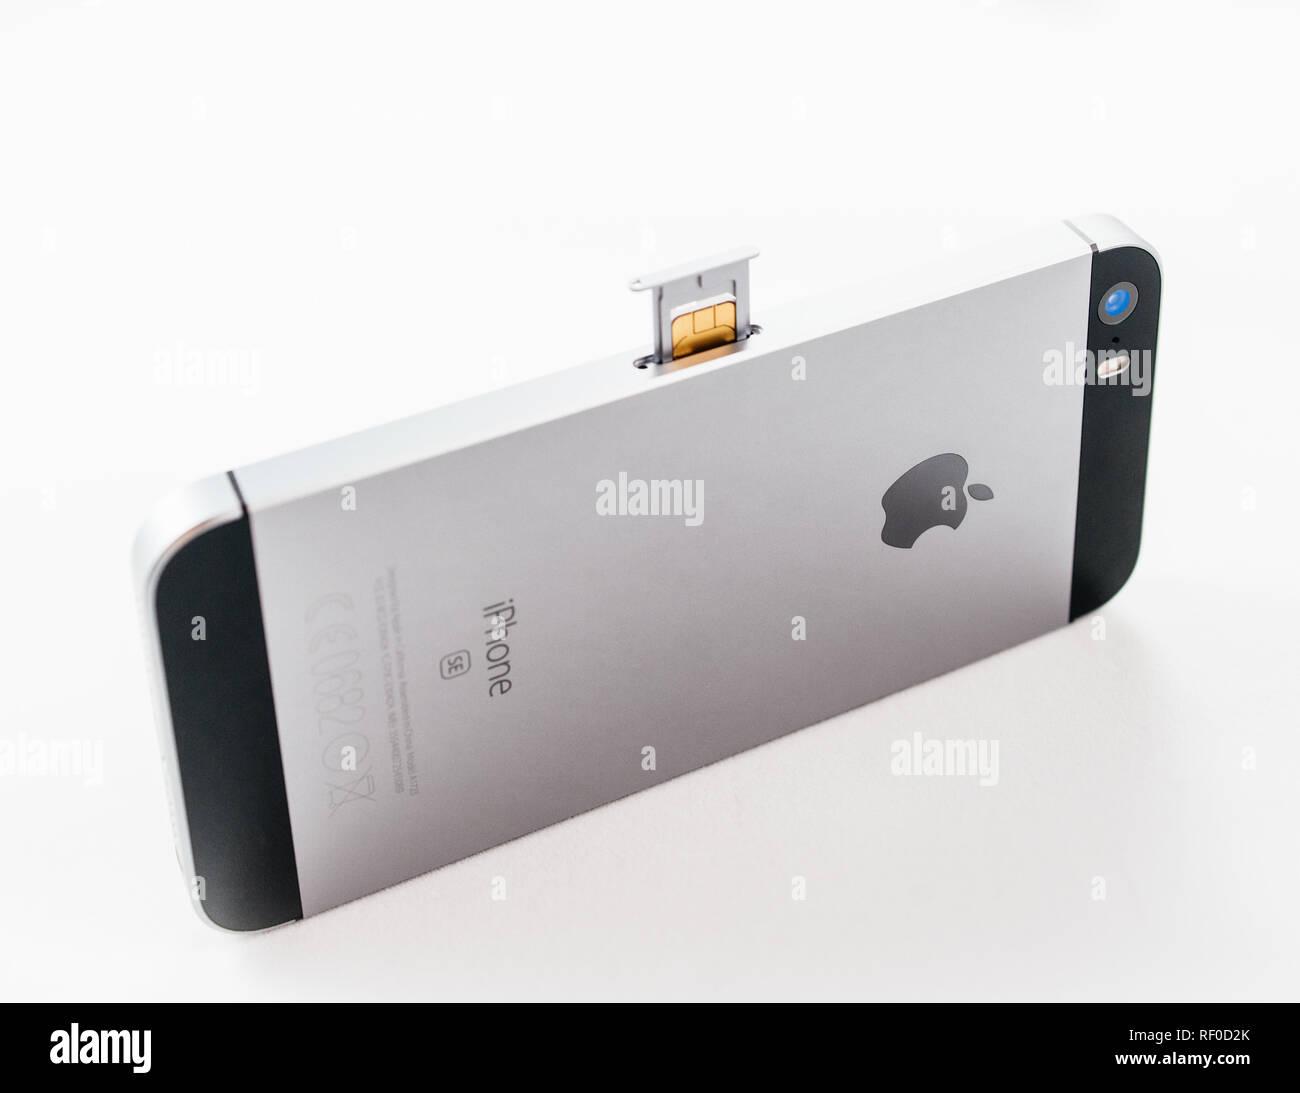 Iphone Se Sim Karte.Subscriber Identity Module Stock Photos Subscriber Identity Module